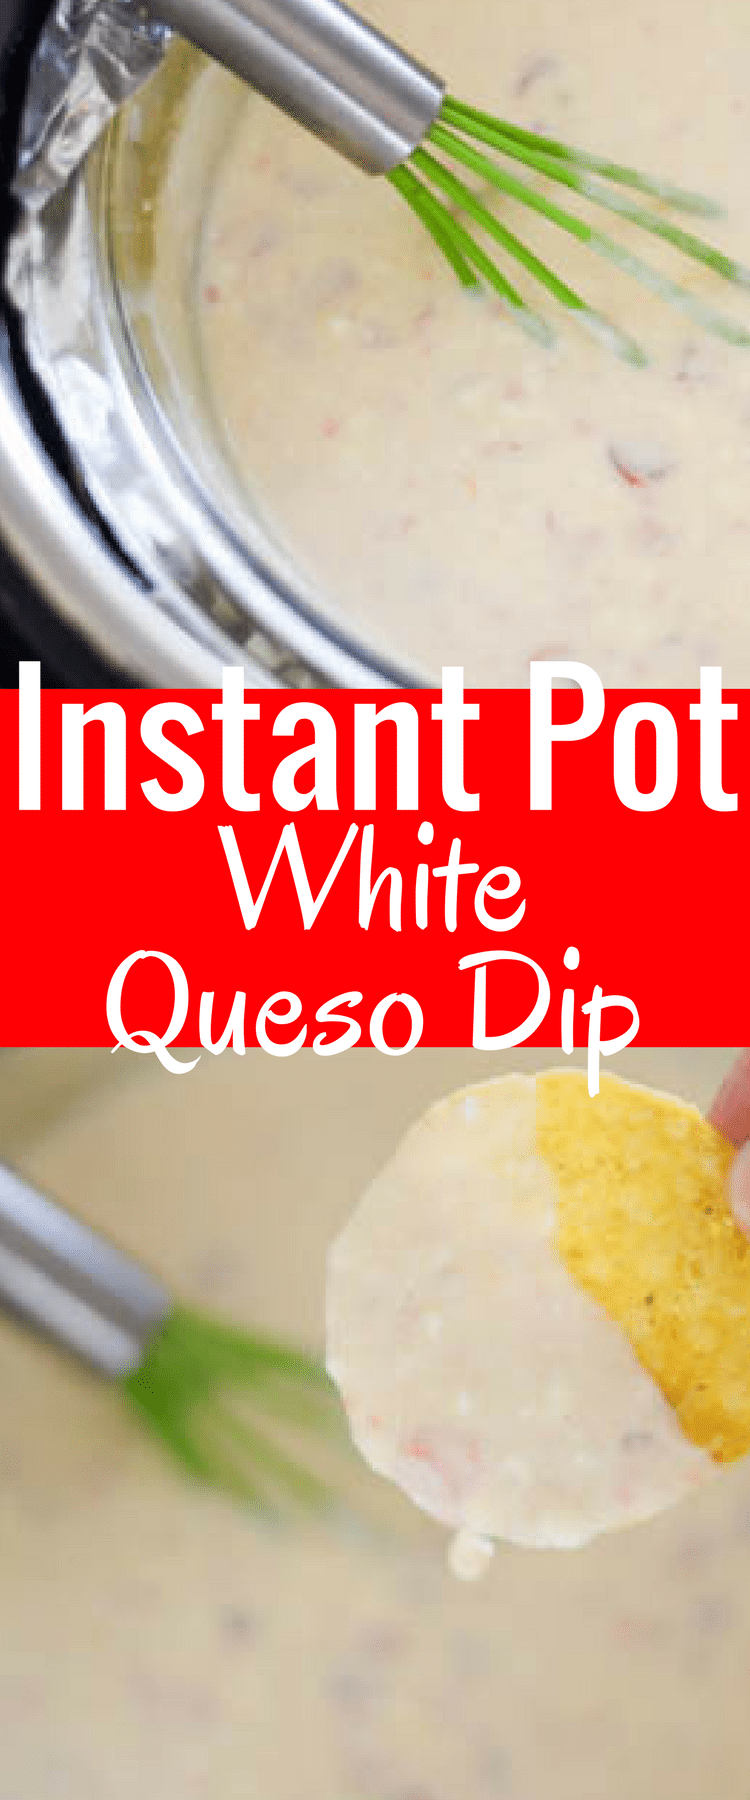 Instant Pot White Queso / Instant Pot Dip / Instant Pot Cheese Sauce / Instant Pot Recipes / Instant Pot / Instant Pot Recipe